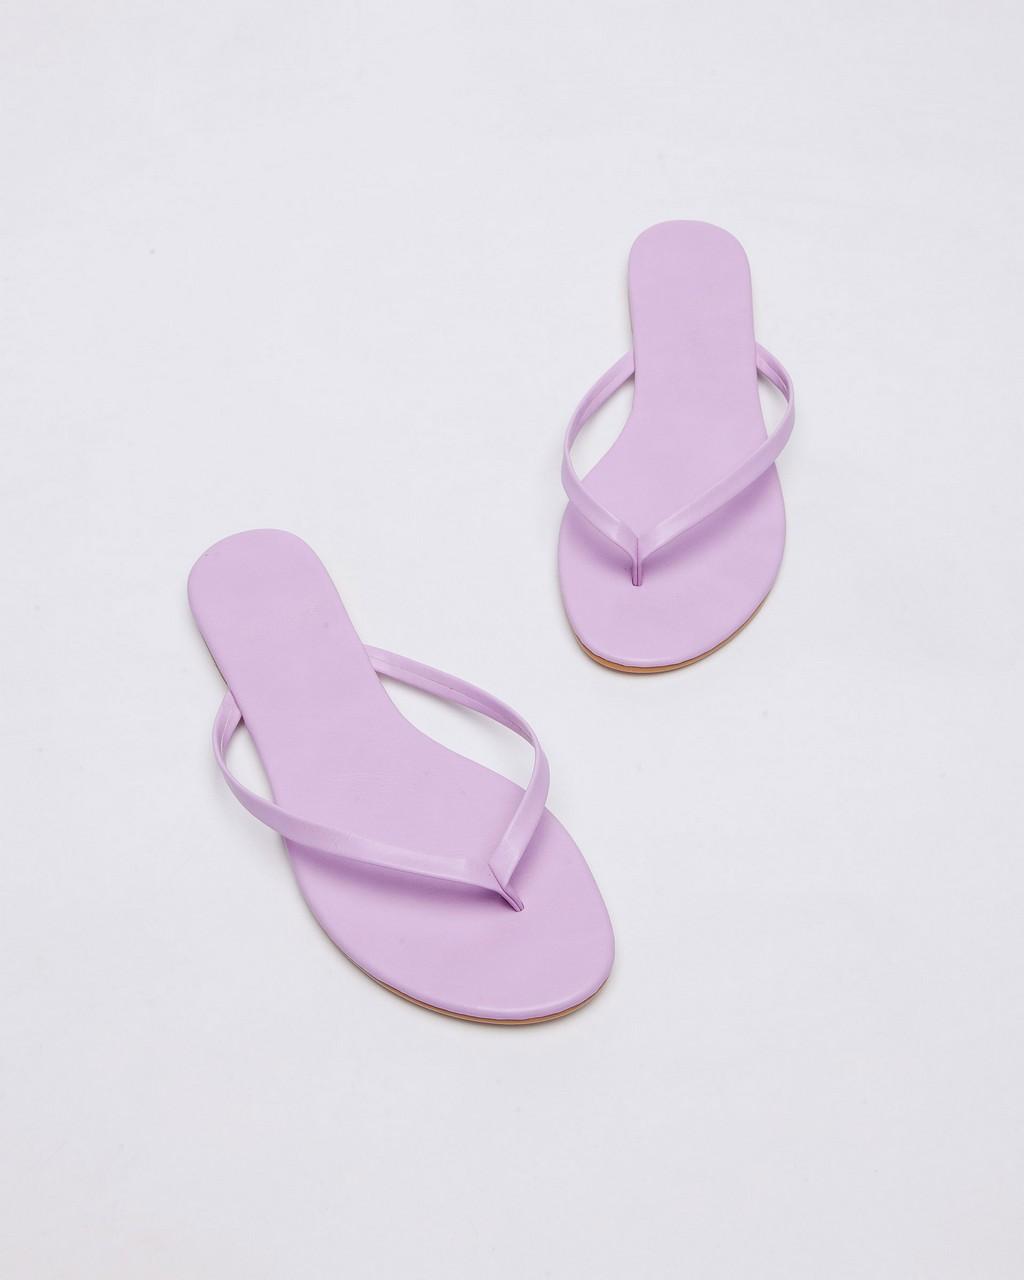 Tagtraume Plasma-02 - Lilac(라일락)